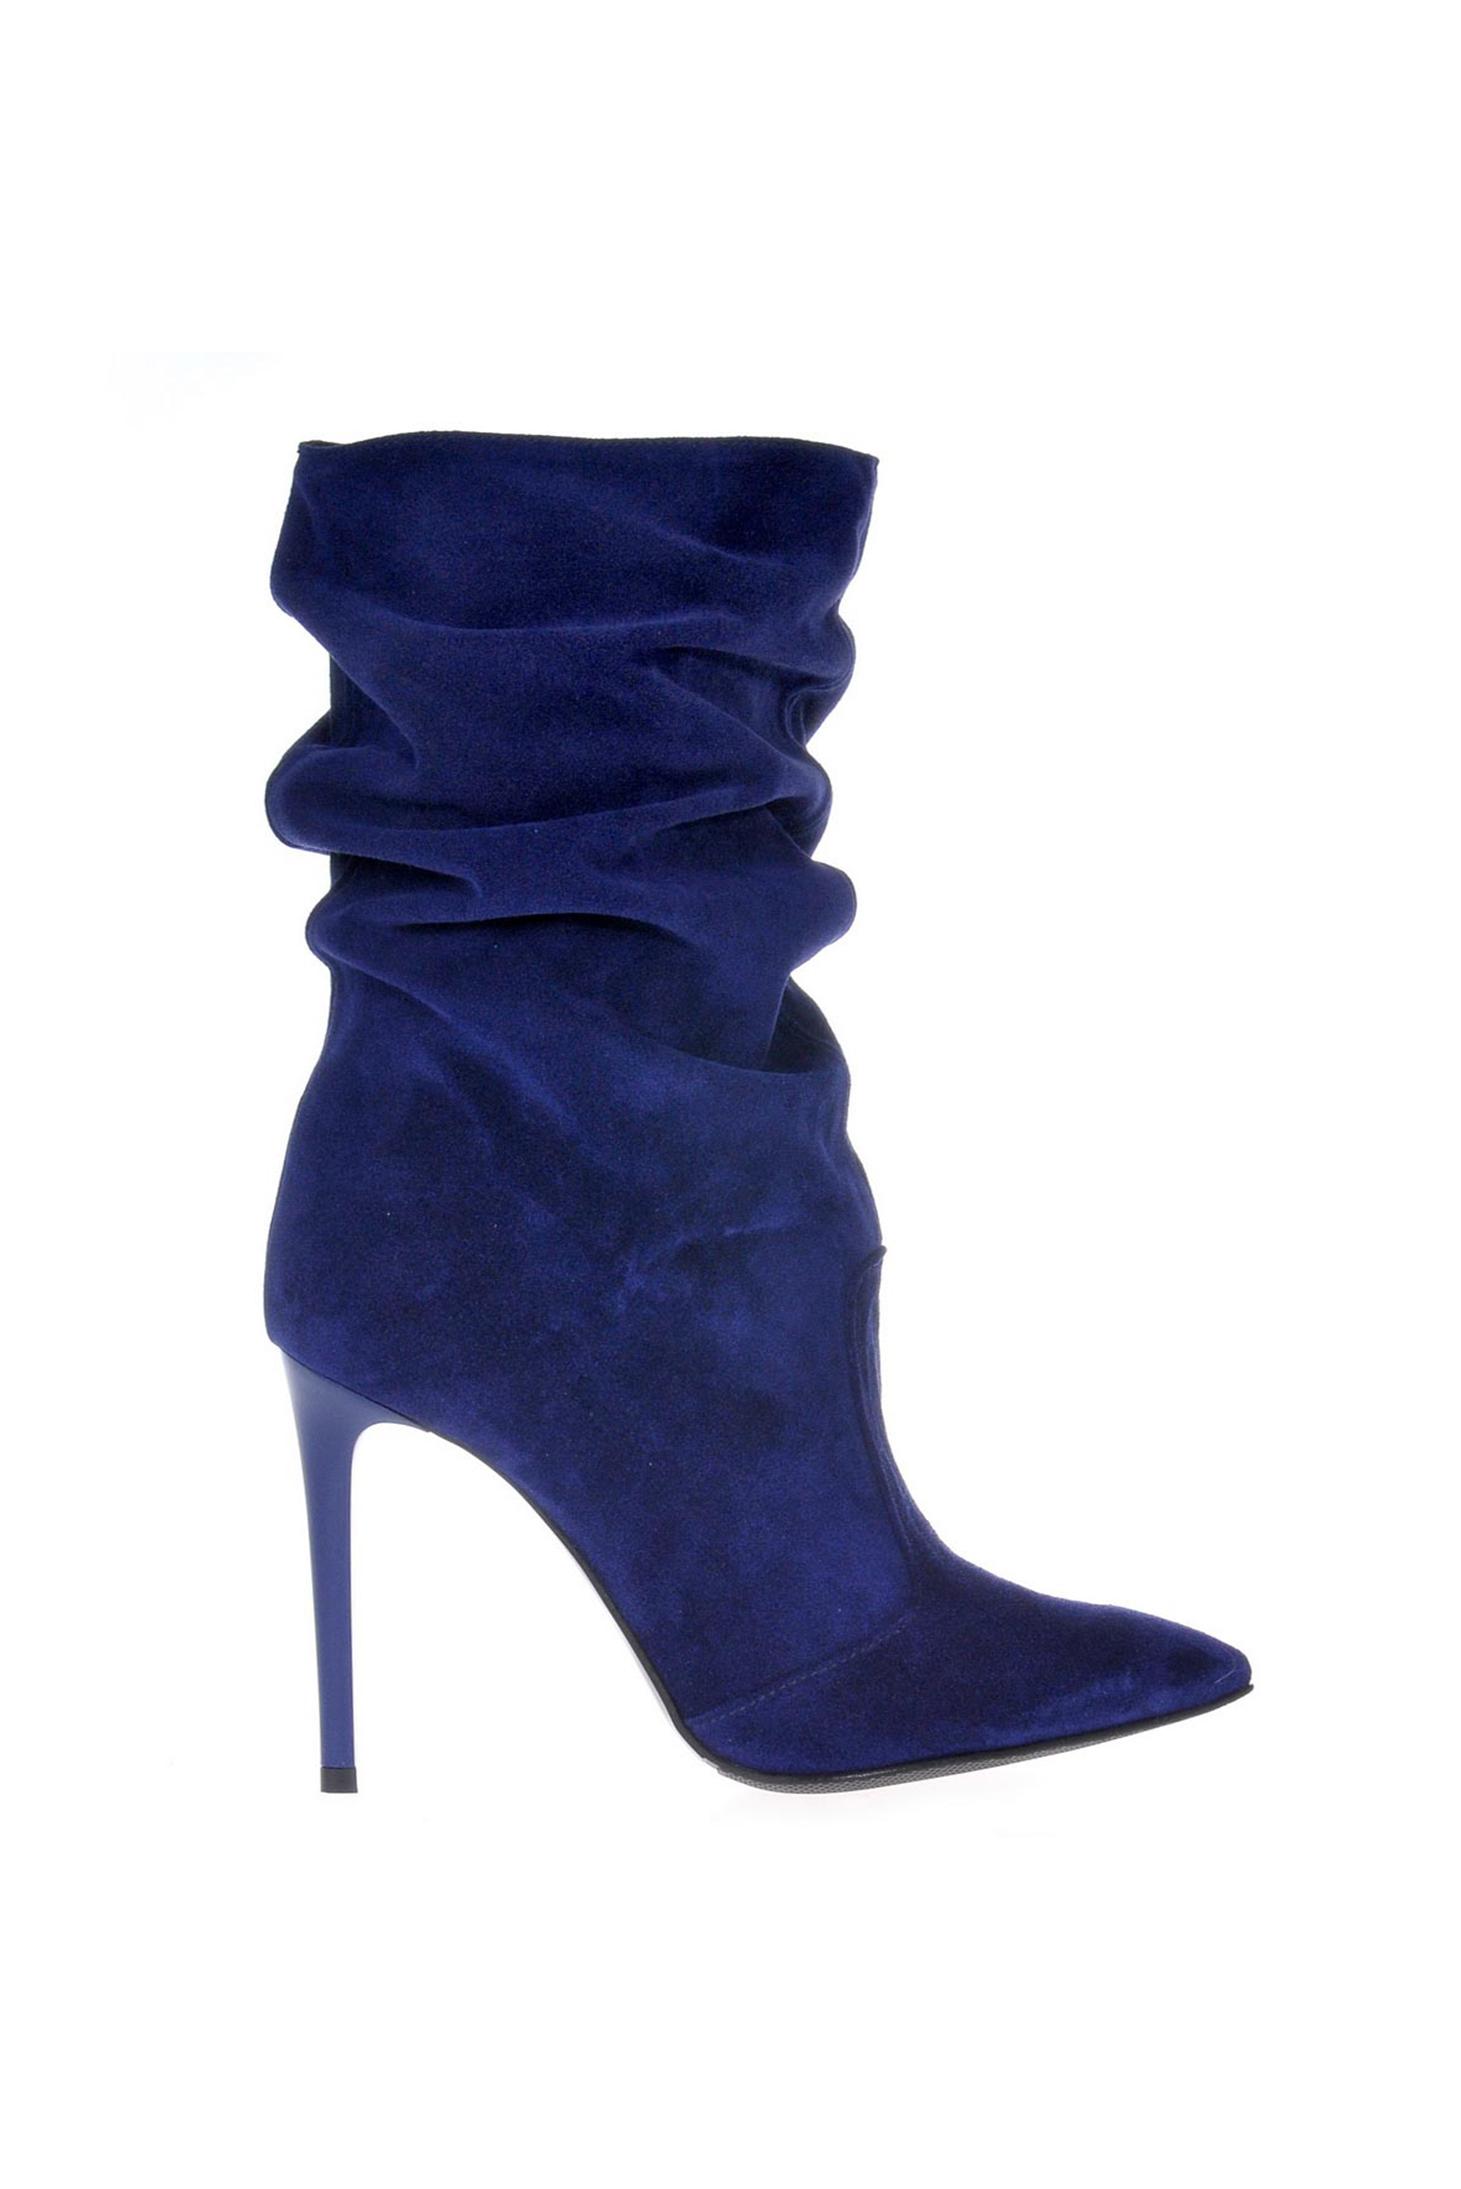 Kék magassarkú csizma be5641e1a8